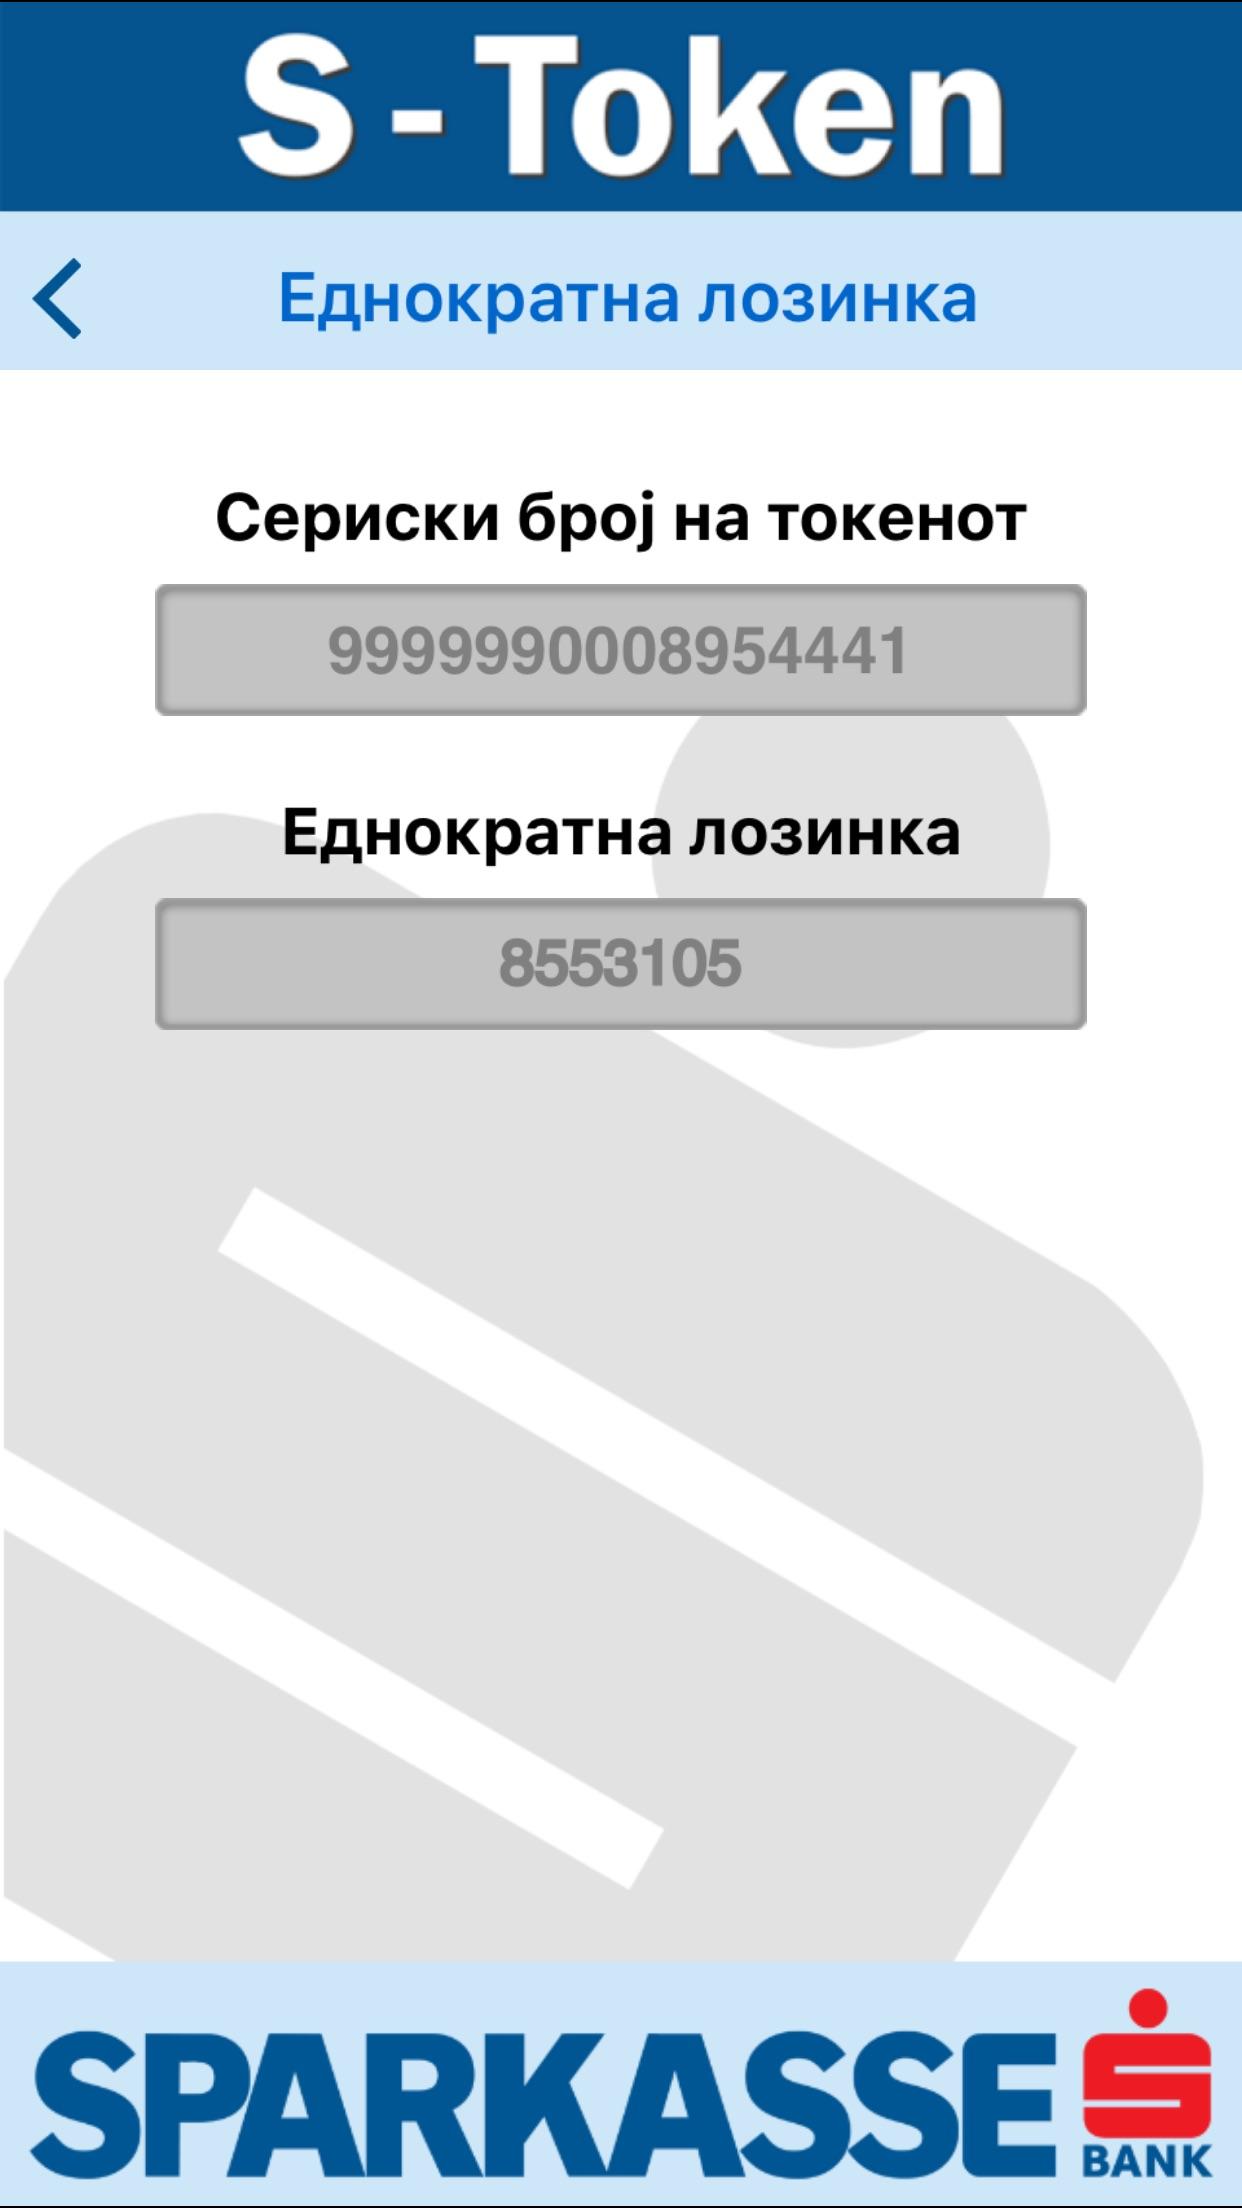 S-token Screenshot